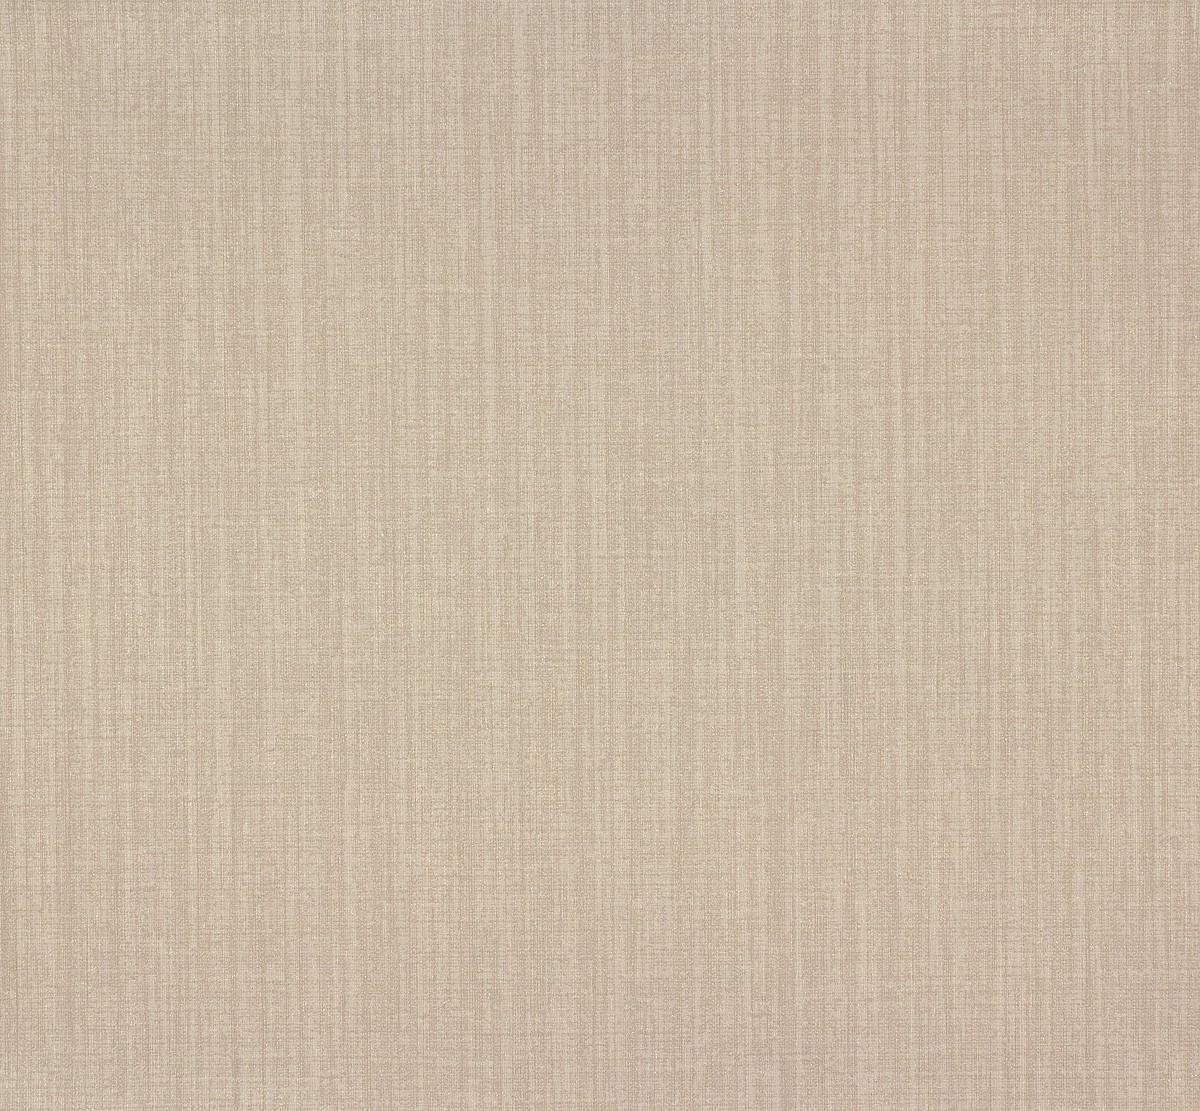 tapete beige metallic uni voyage erismann 5955 02. Black Bedroom Furniture Sets. Home Design Ideas